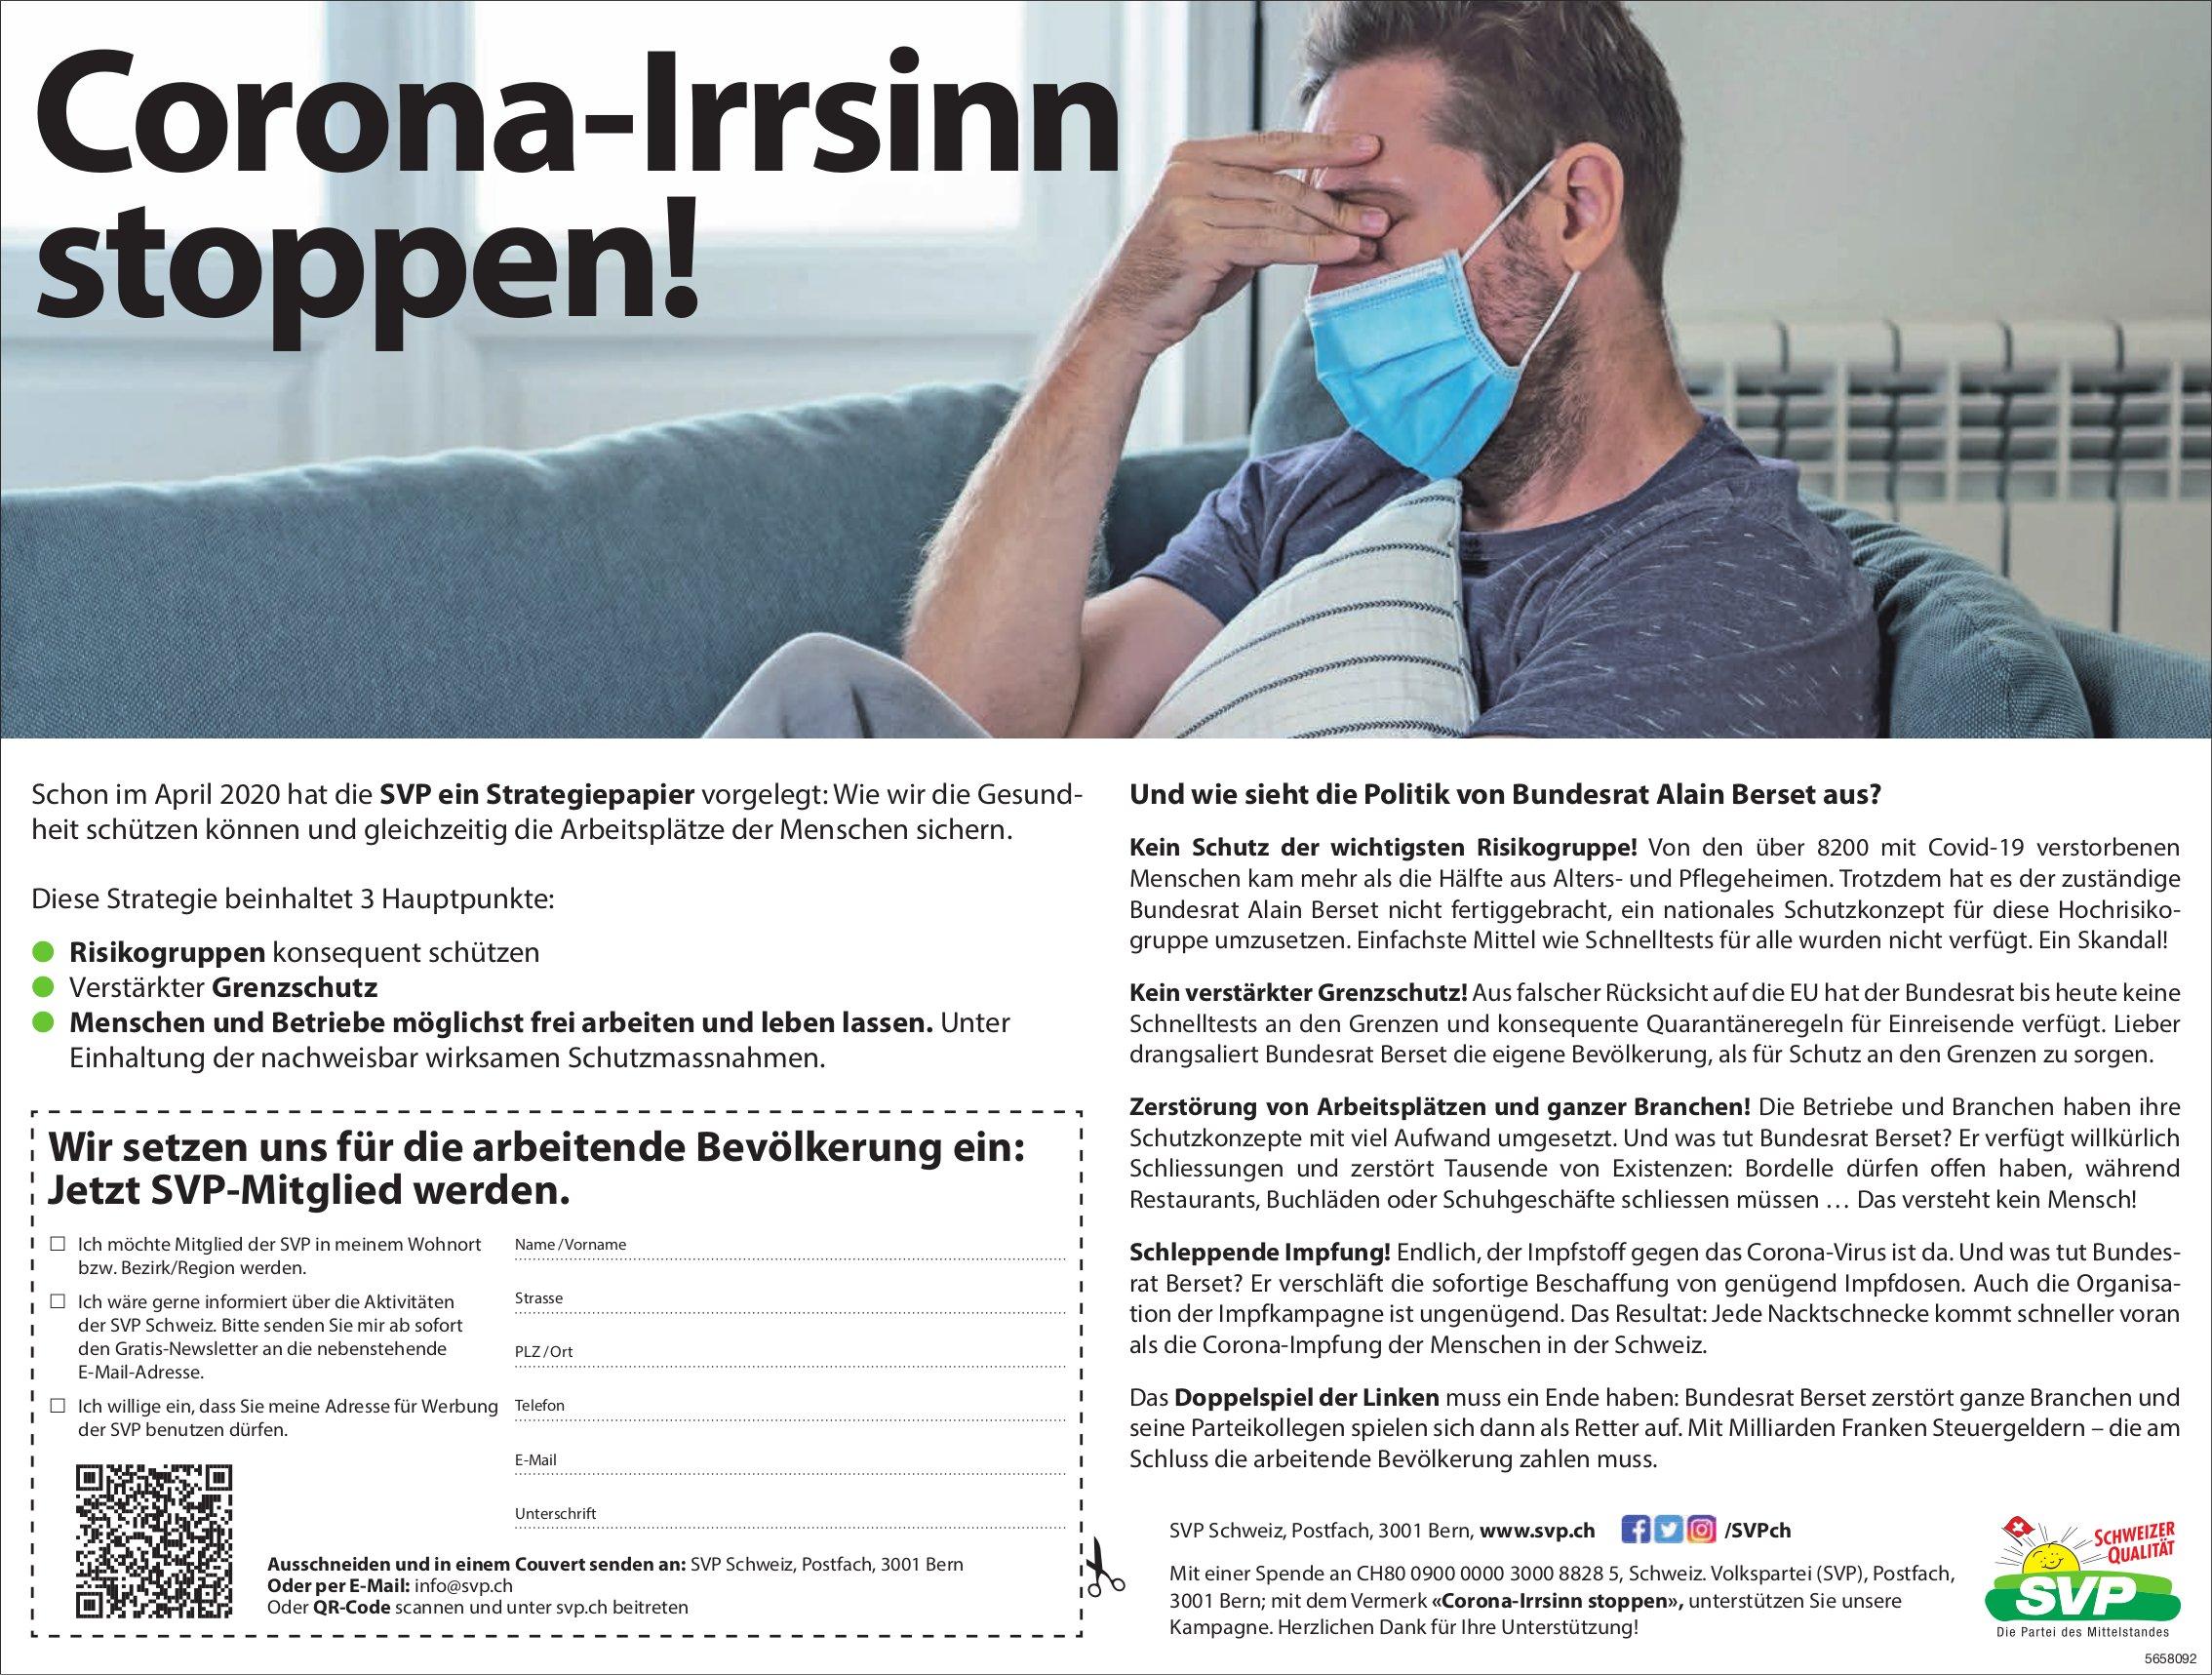 SVP - Corona-Irrsinn stoppen!